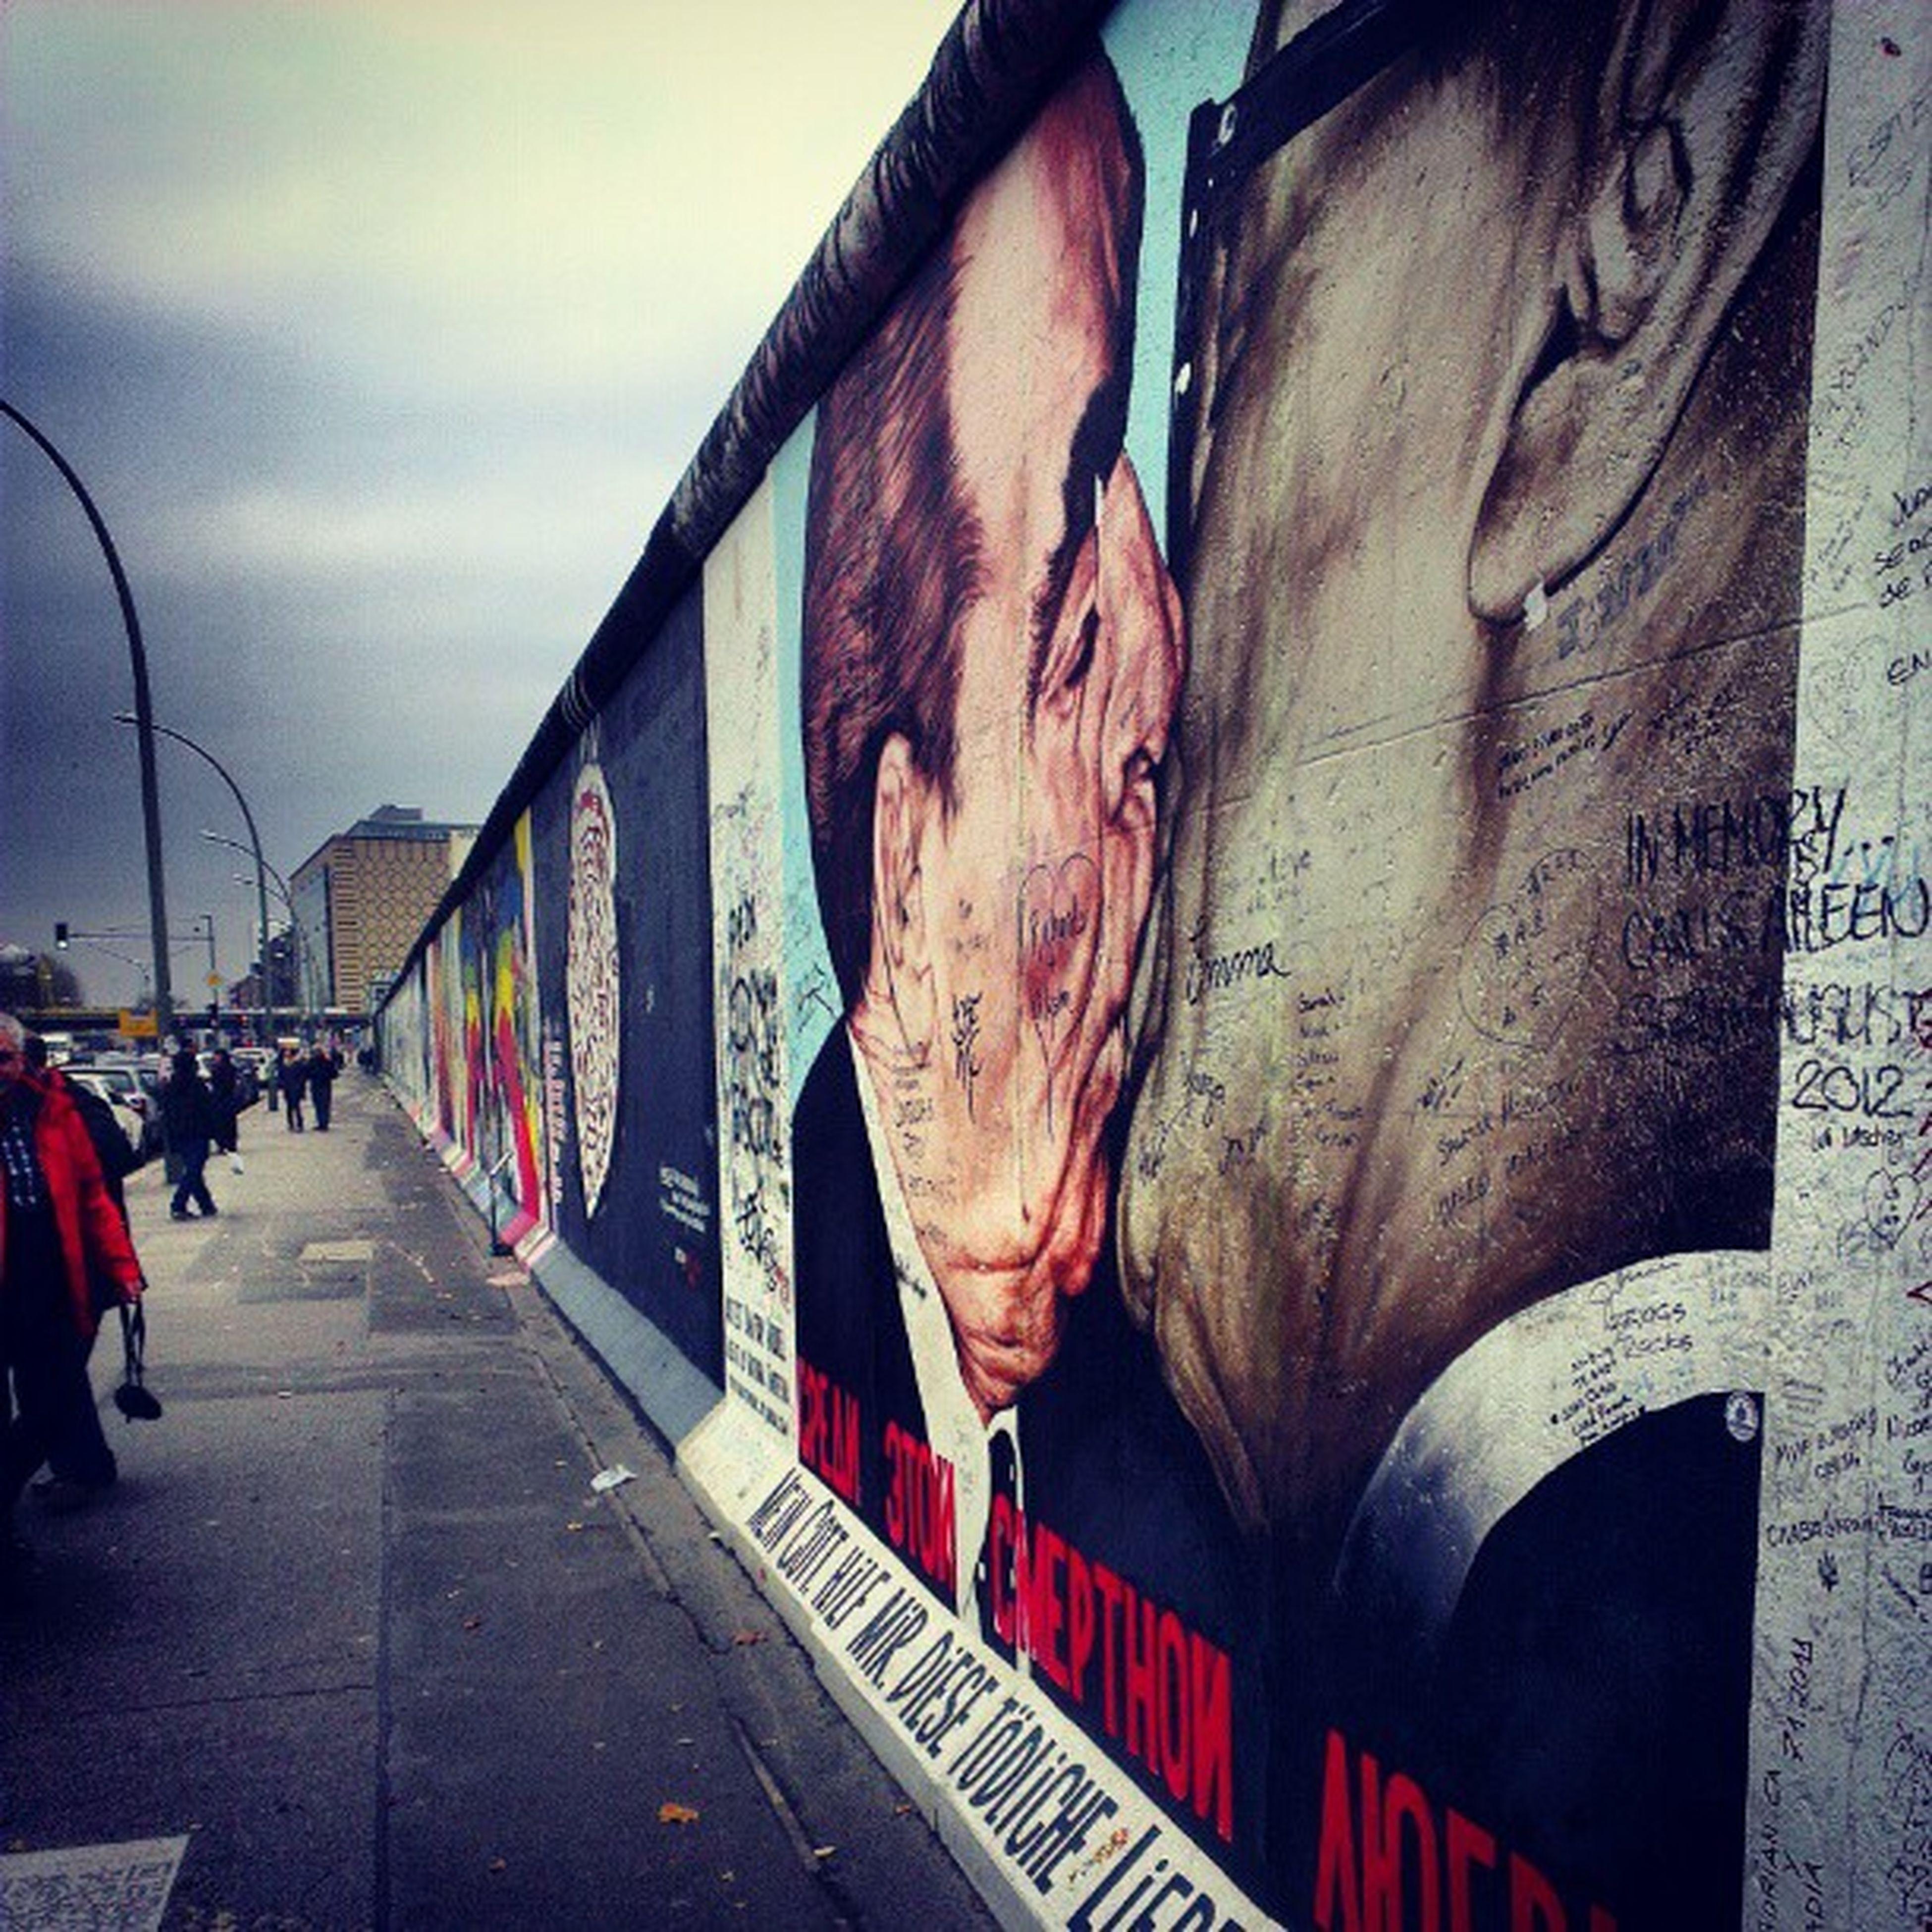 Die #Eastsidegallery. #Berlin #Honecker #BerlinerMauer #Gorbatschow #GeschwisterKuss #Bildungsfahrt Eastsidegallery Gorbatschow Honecker Berlin Berlinermauer Bildungsfahrt Geschwisterkuss